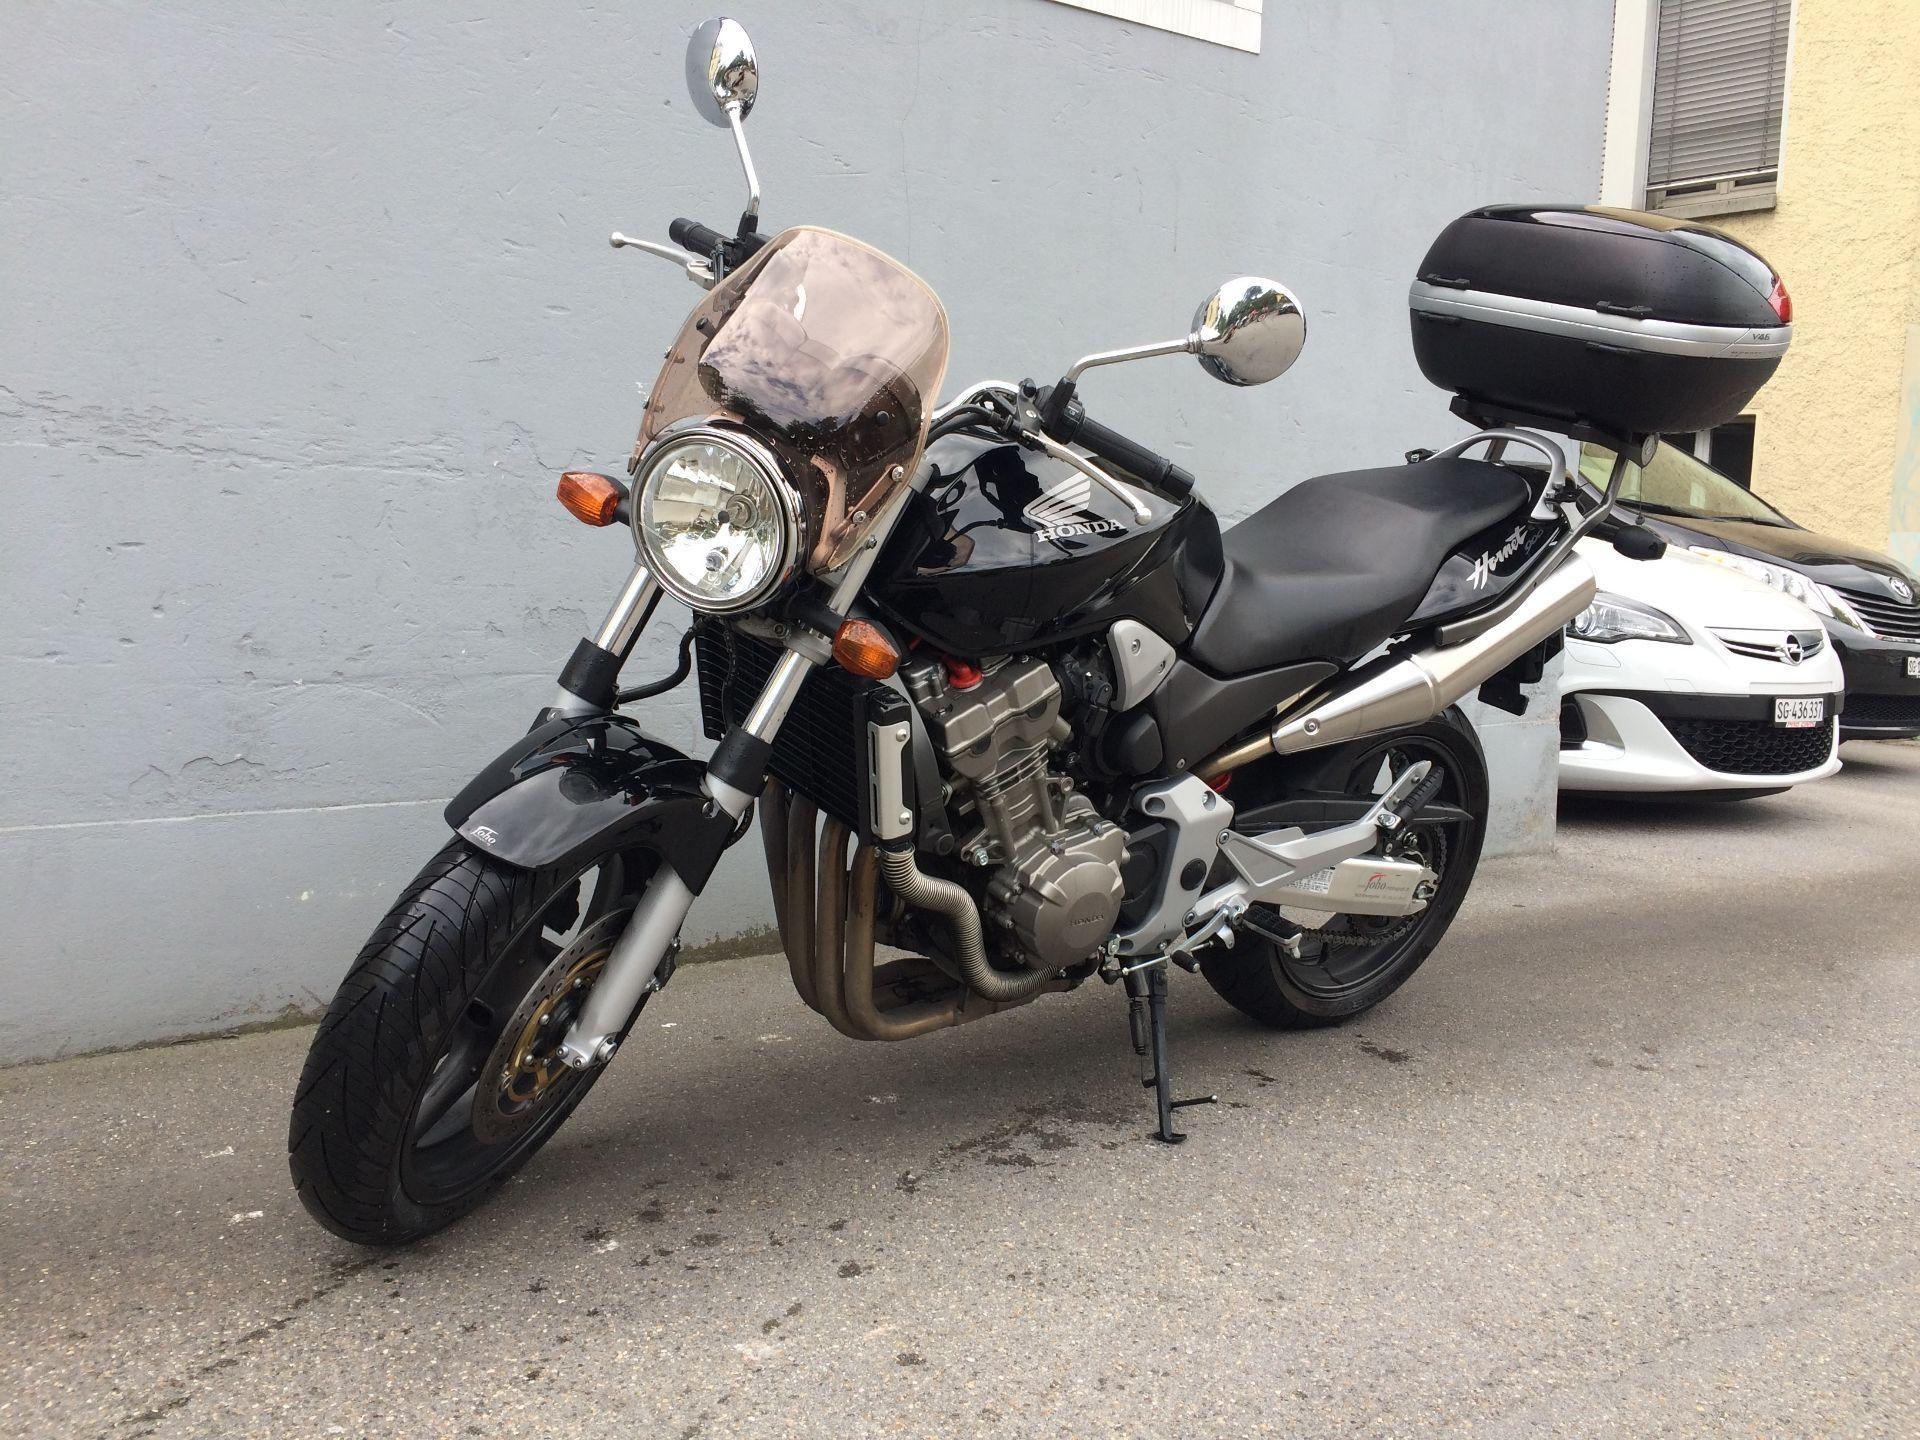 Honda CB 900 Hornet kaufen auf Ricardo